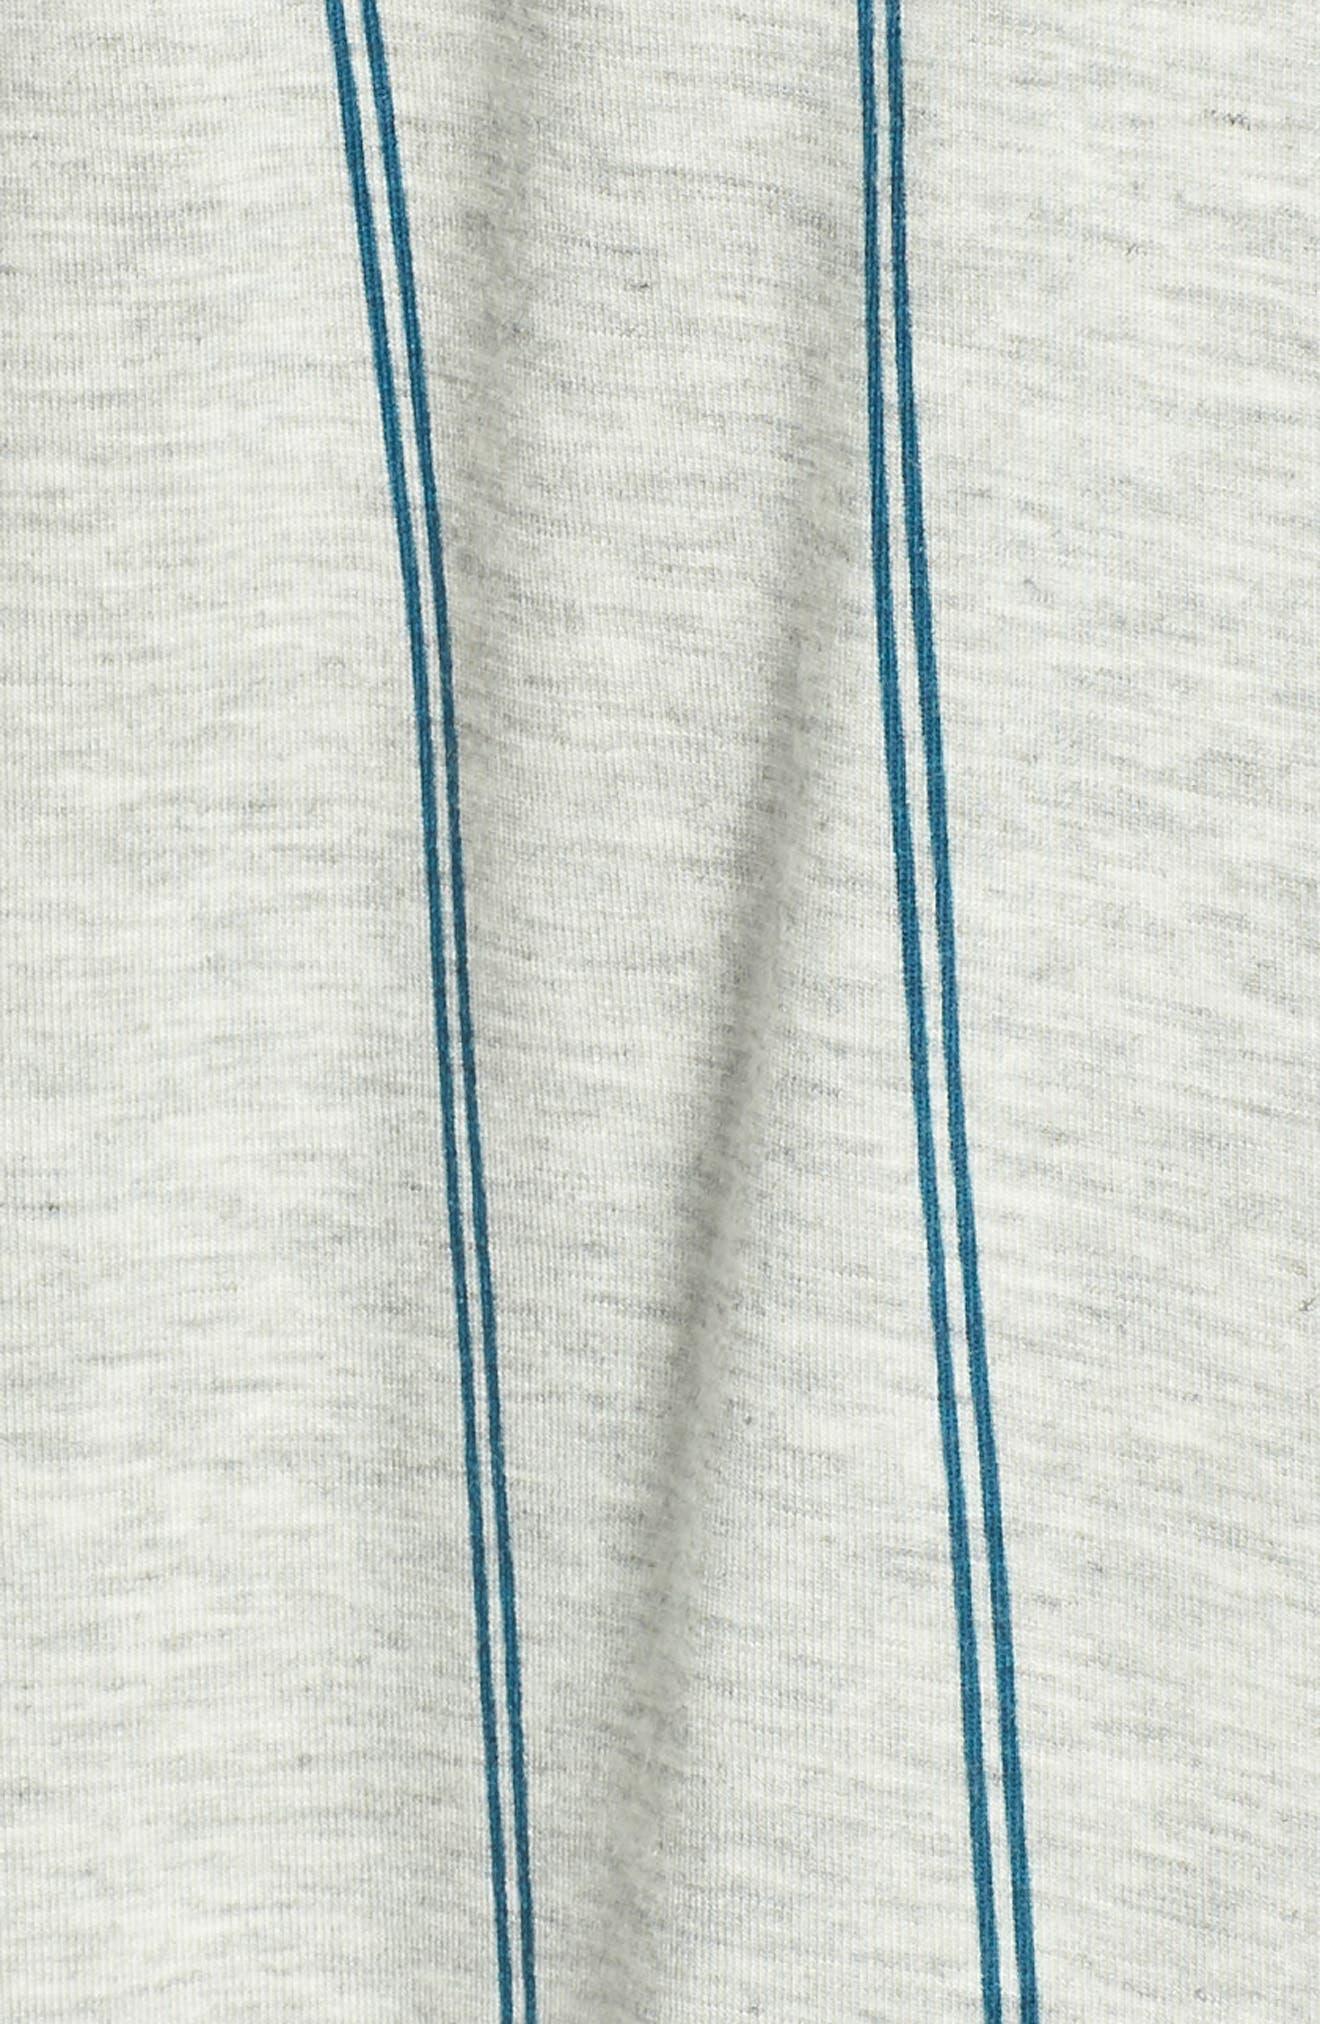 NORDSTROM LINGERIE, Moonlight Pajamas, Alternate thumbnail 5, color, GREY PEARL HEATHER MICROSTRIPE